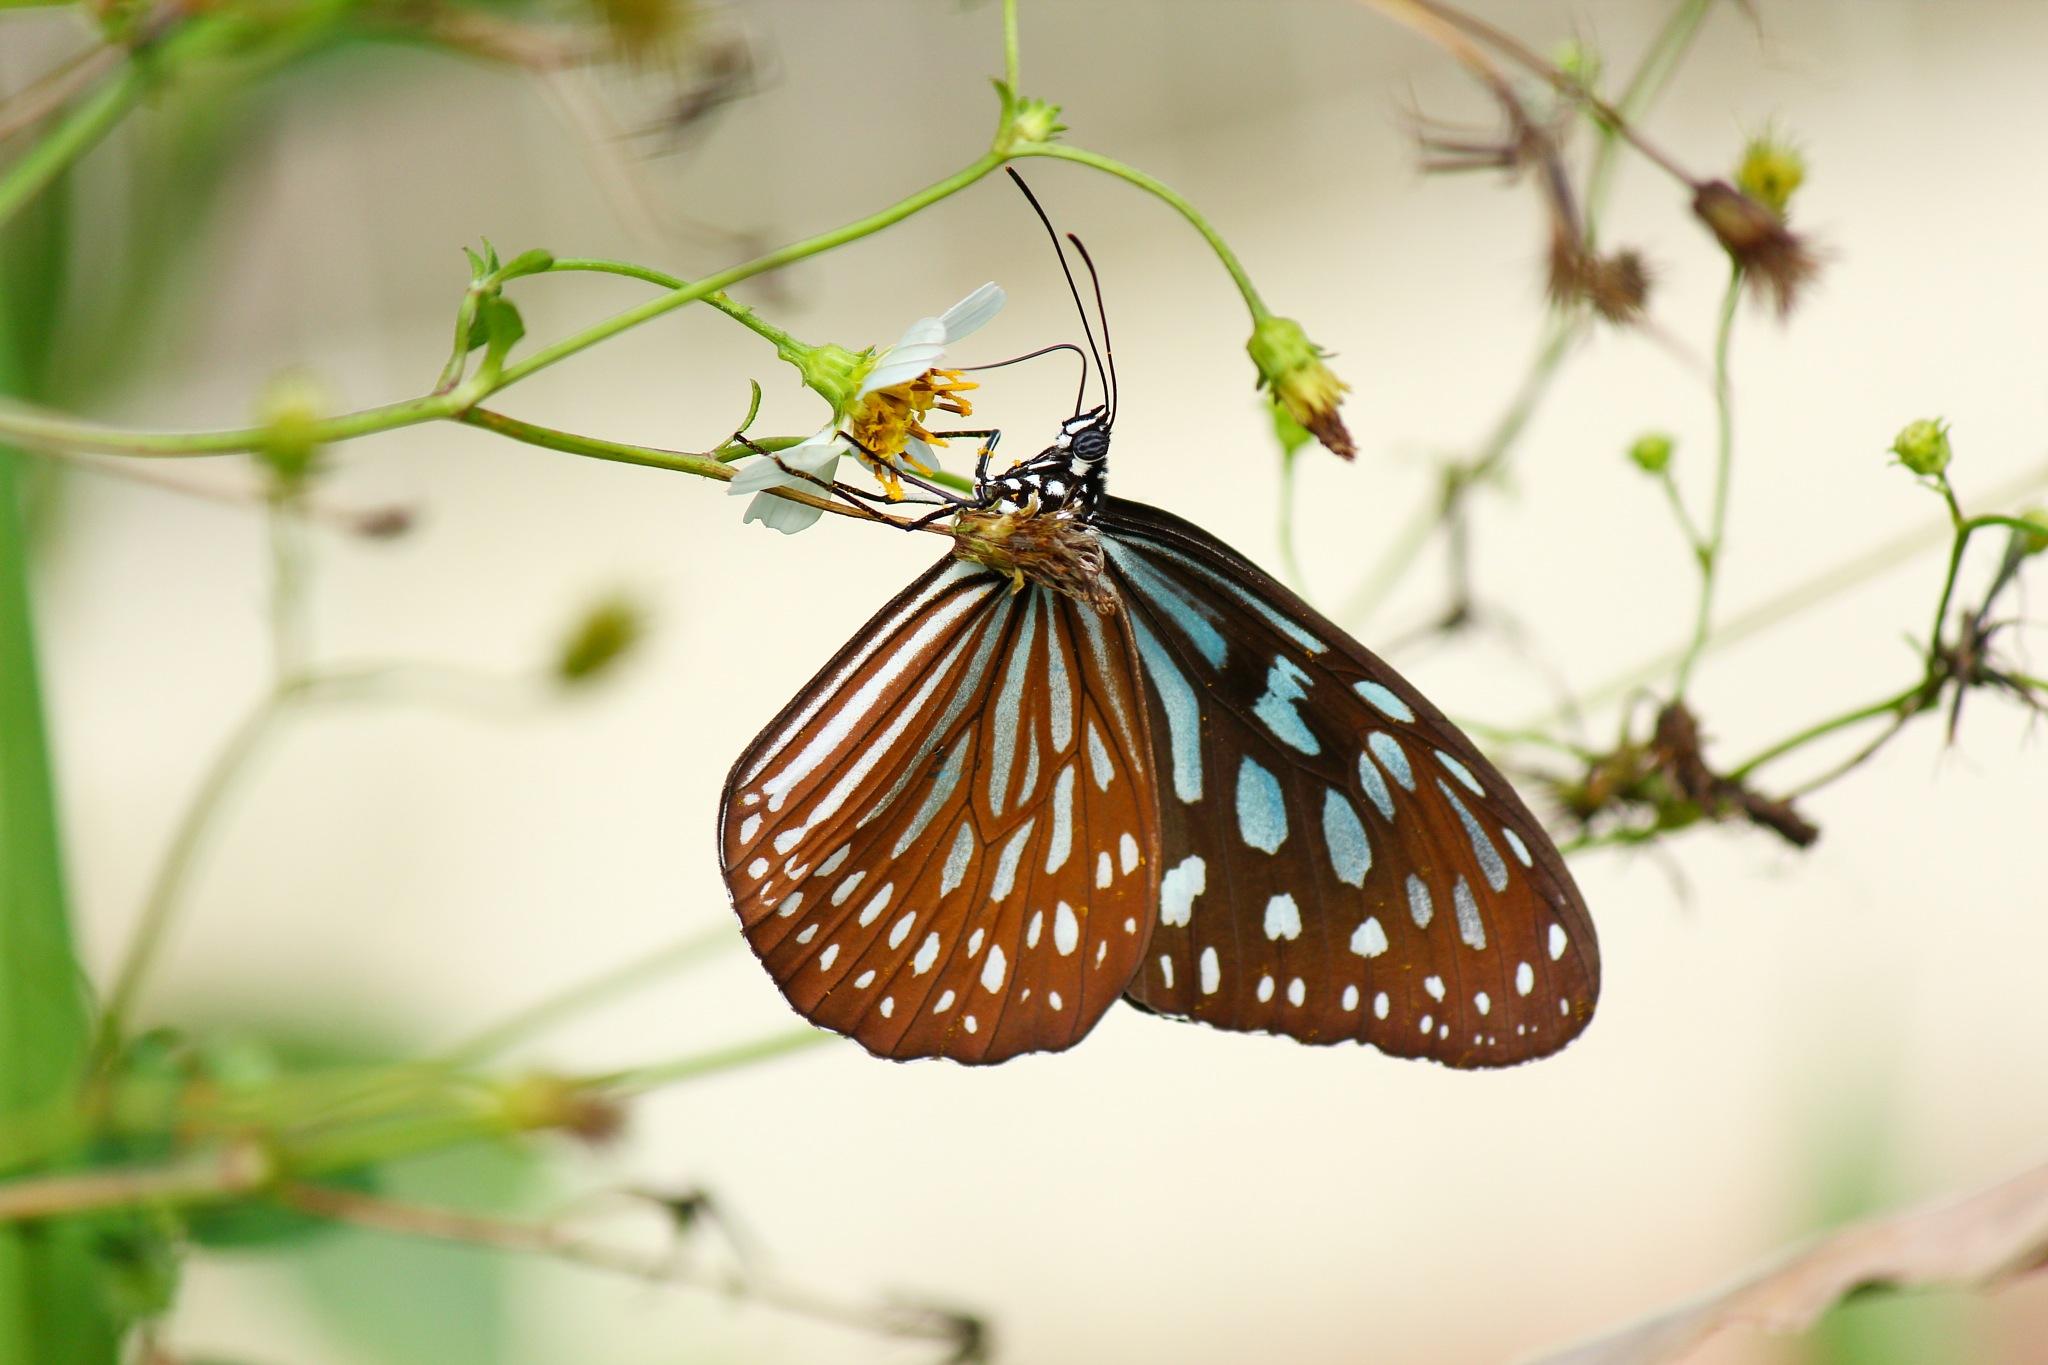 Butterfly by myhsu123